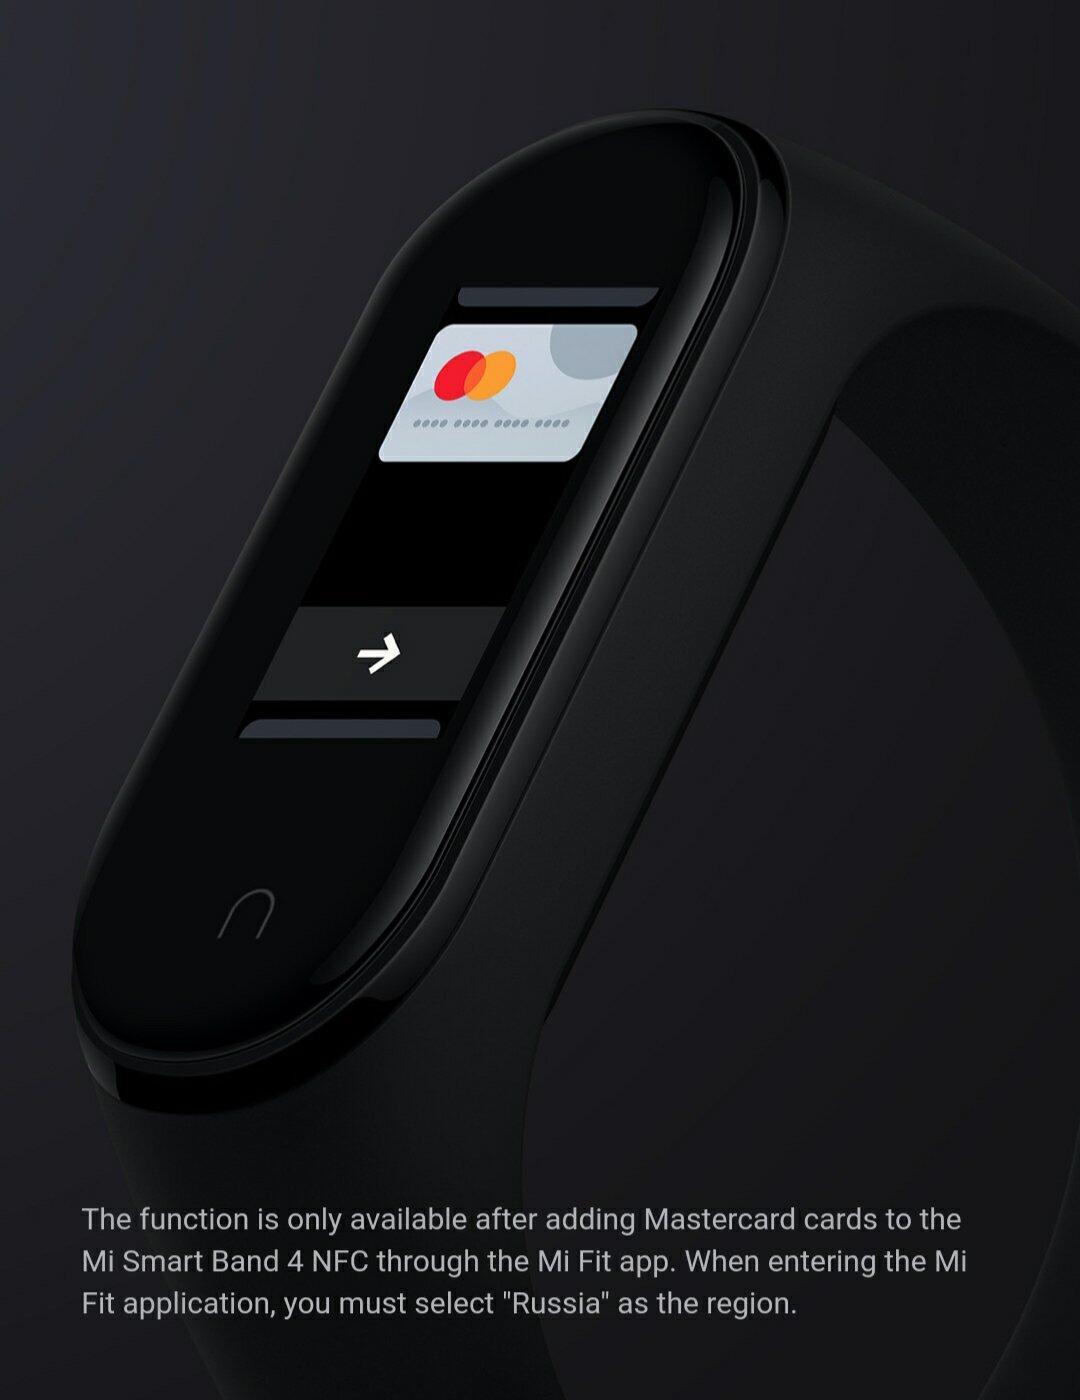 Xiaomi Mi Band 4 Mastercard